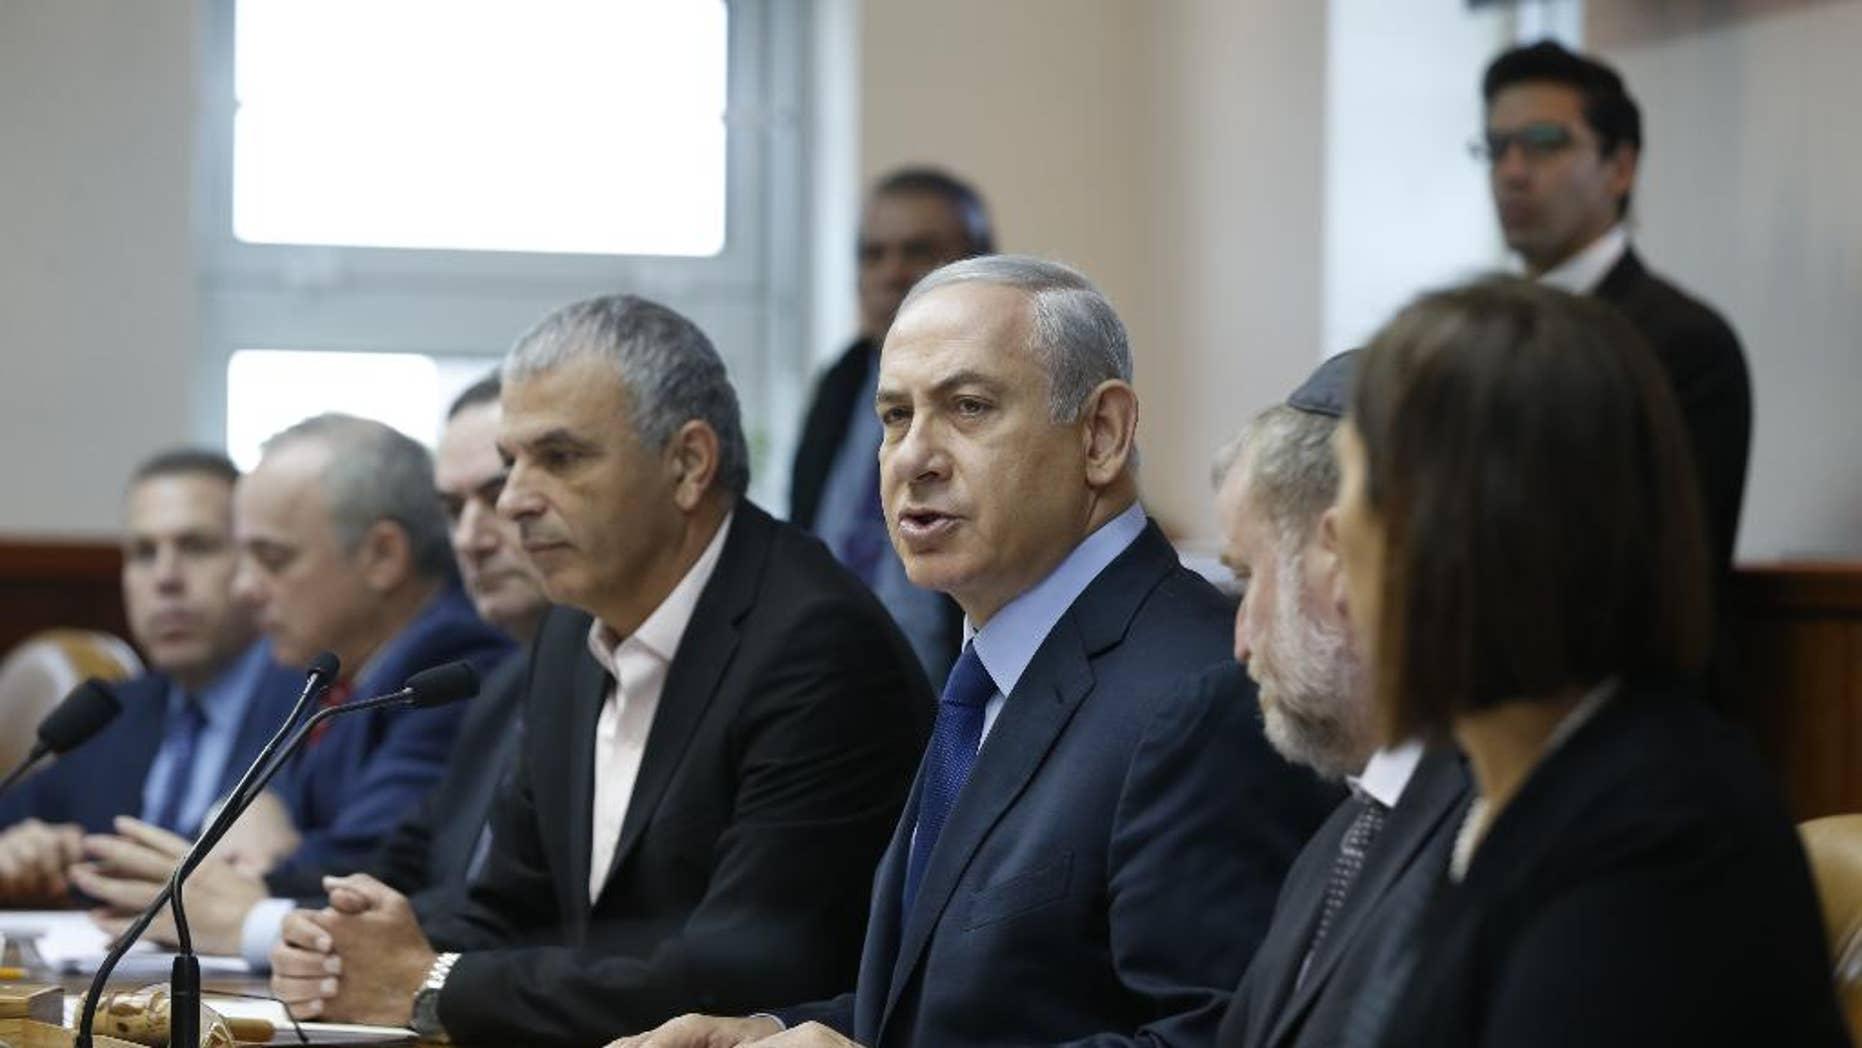 Israel's Prime Minister Benjamin Netanyahu, center, speaks during the weekly cabinet meeting in Jerusalem, Sunday, Dec. 13, 2015. (Baz Ratner/Pool Photo via AP)